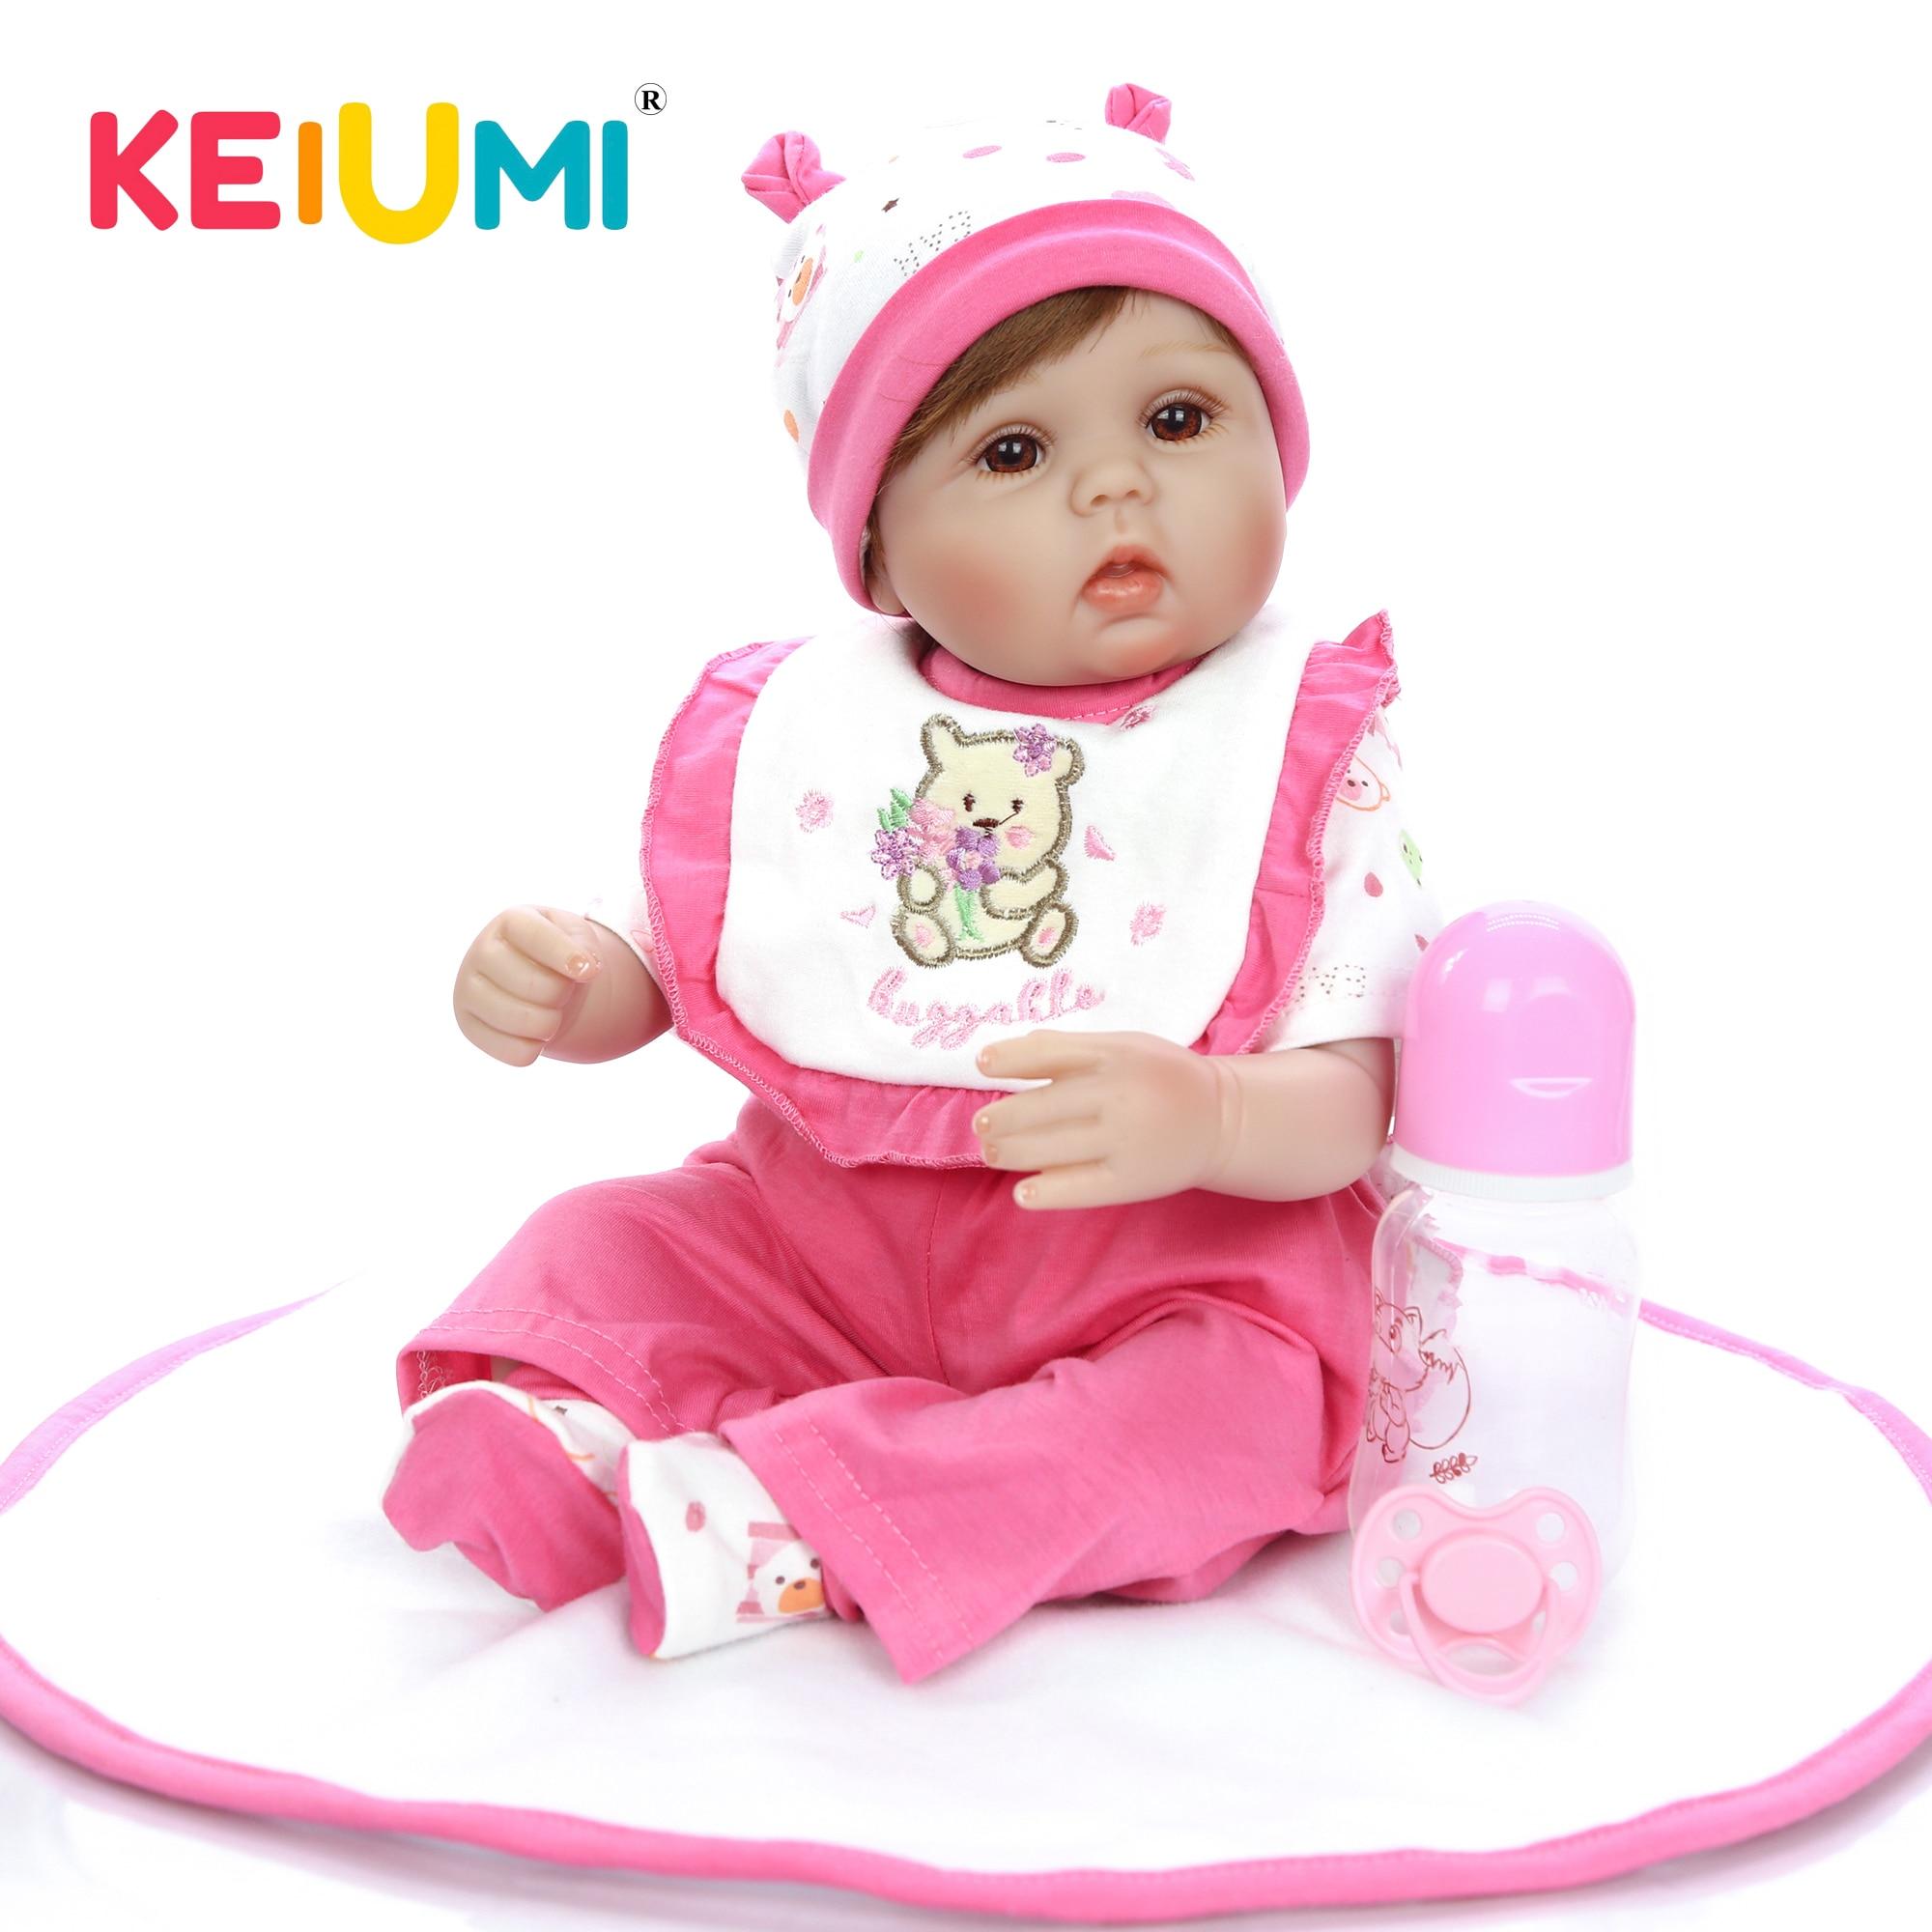 Keiumi atacado 17 reborn reborn reborn boneca menina silicone macio reborn boneca do bebê brinquedo para o dia das crianças da menina presente recheado boneca playmate